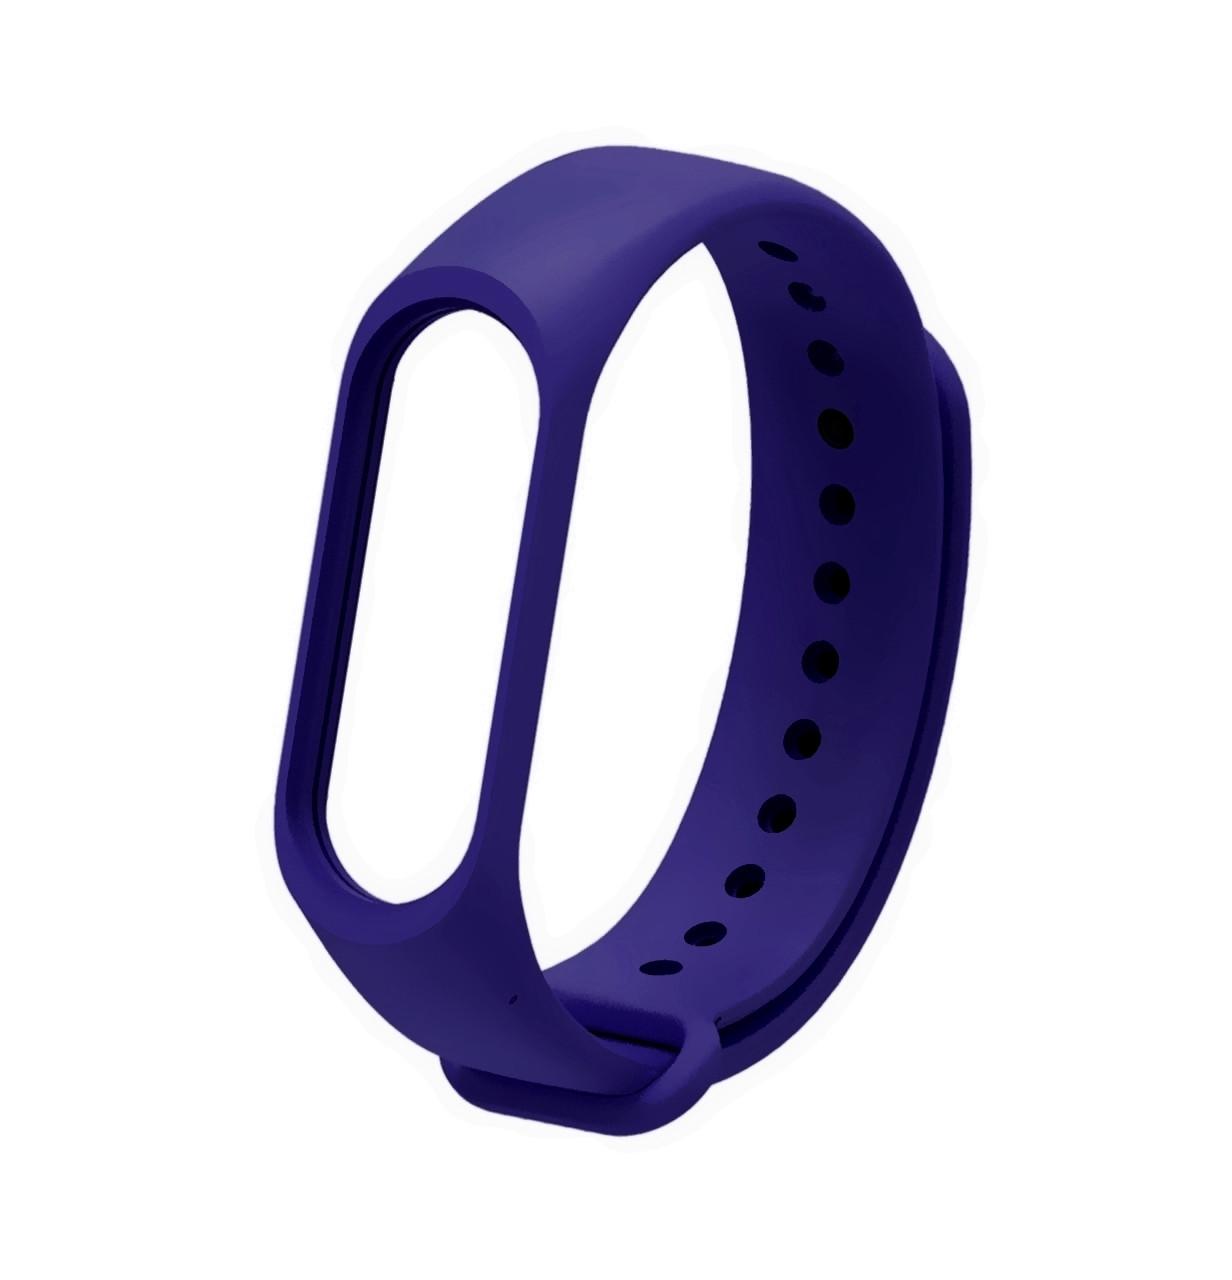 Ремешок Silicone для фитнес-браслета Xiaomi Mi Band 3 / Mi Band 4 Navy Blue